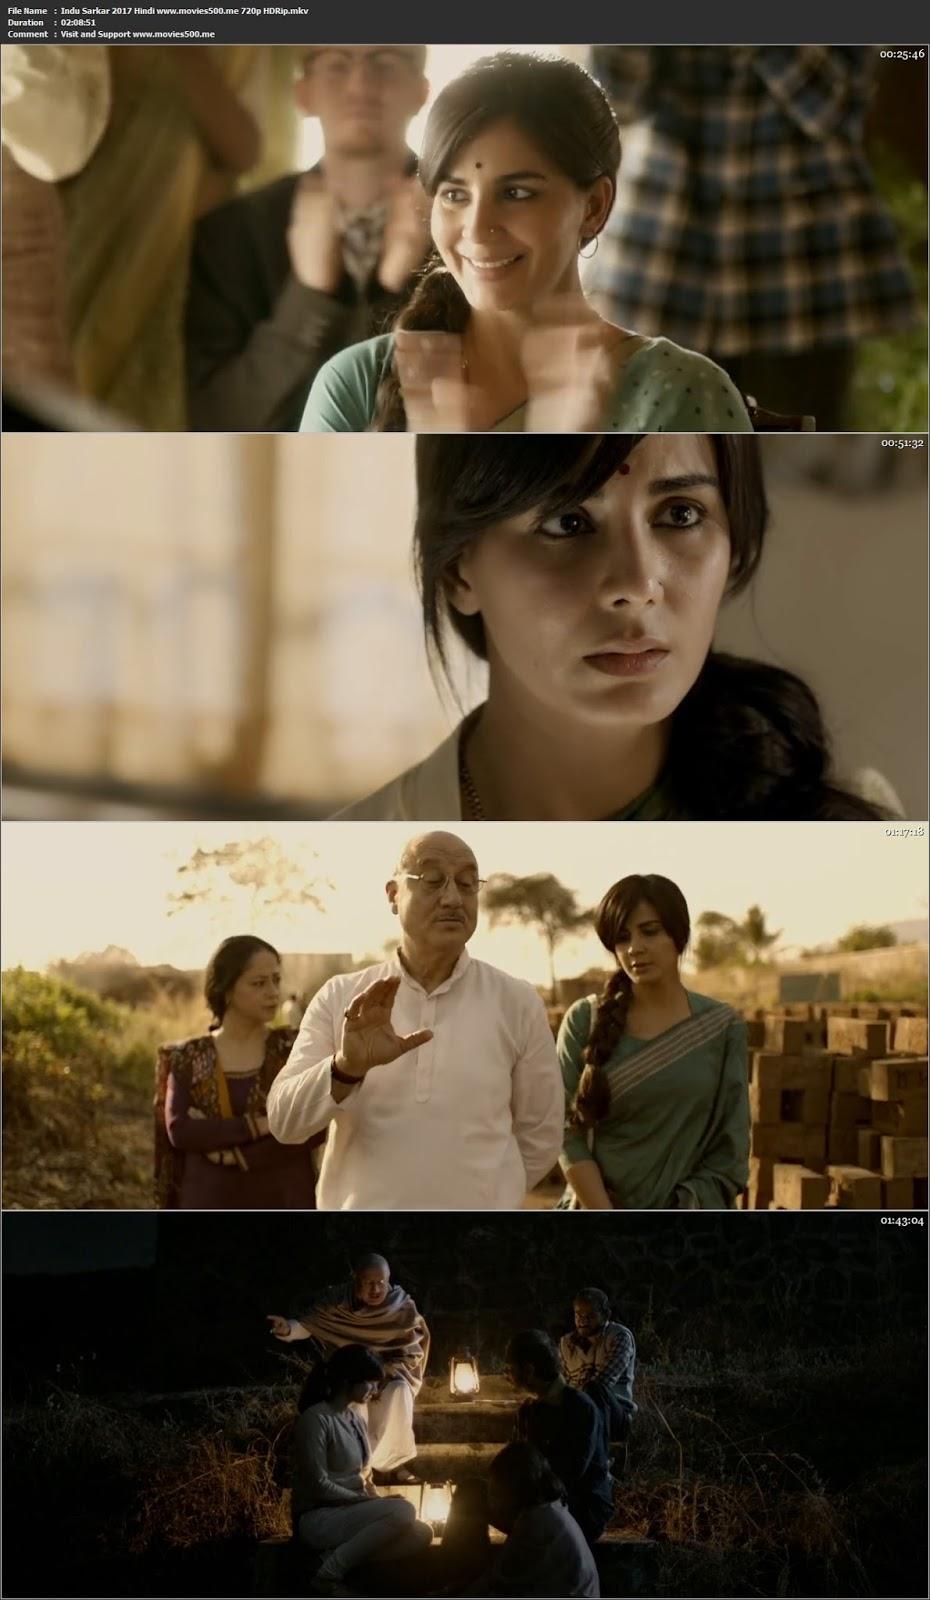 Indu Sarkar 2017 Hindi Full Movie HDrip 720p at gileadhomecare.com